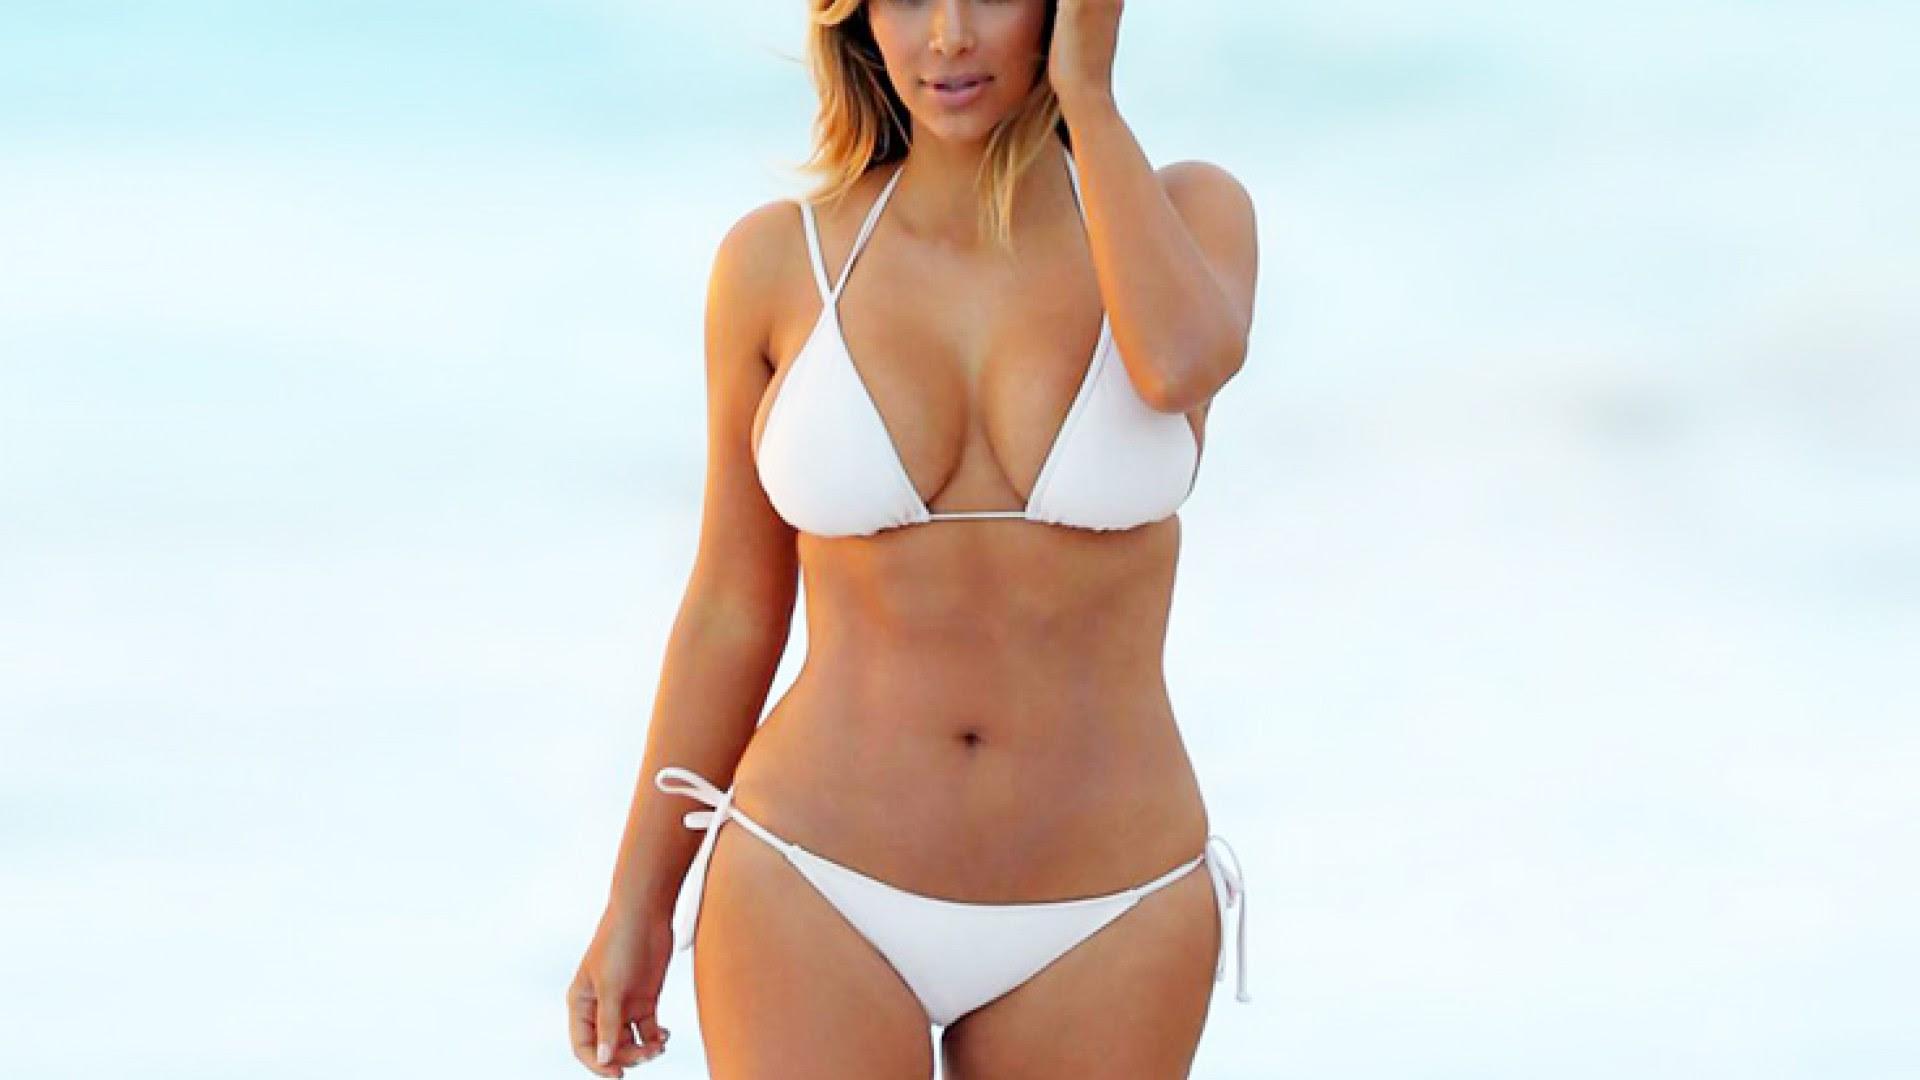 Kim Kardashian Hot Hd Wallpaper For Desktop And Mobiles Iphone 7